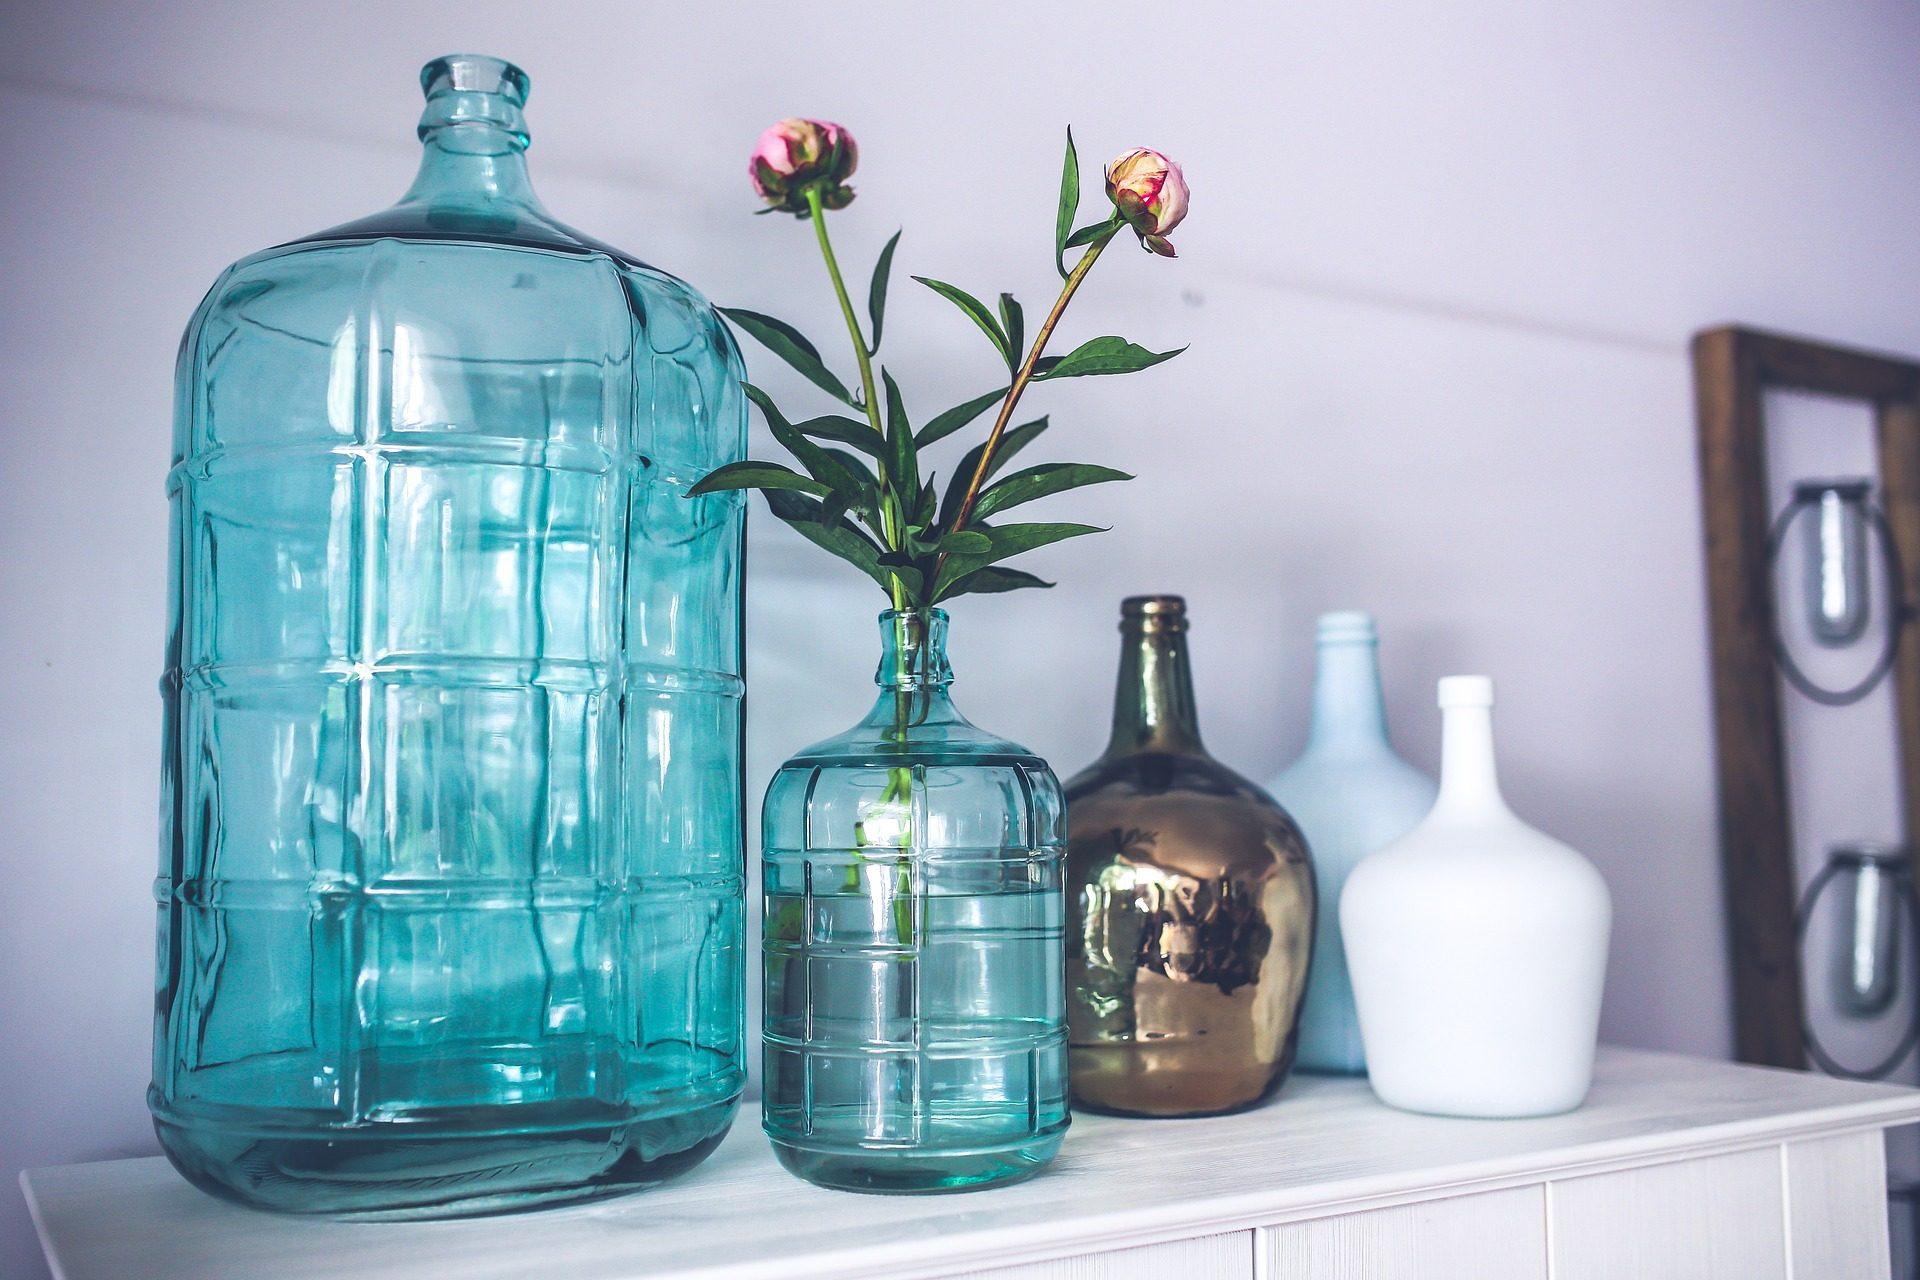 bouteilles, vases, plantes, fleurs, reflets, Crystal - Fonds d'écran HD - Professor-falken.com